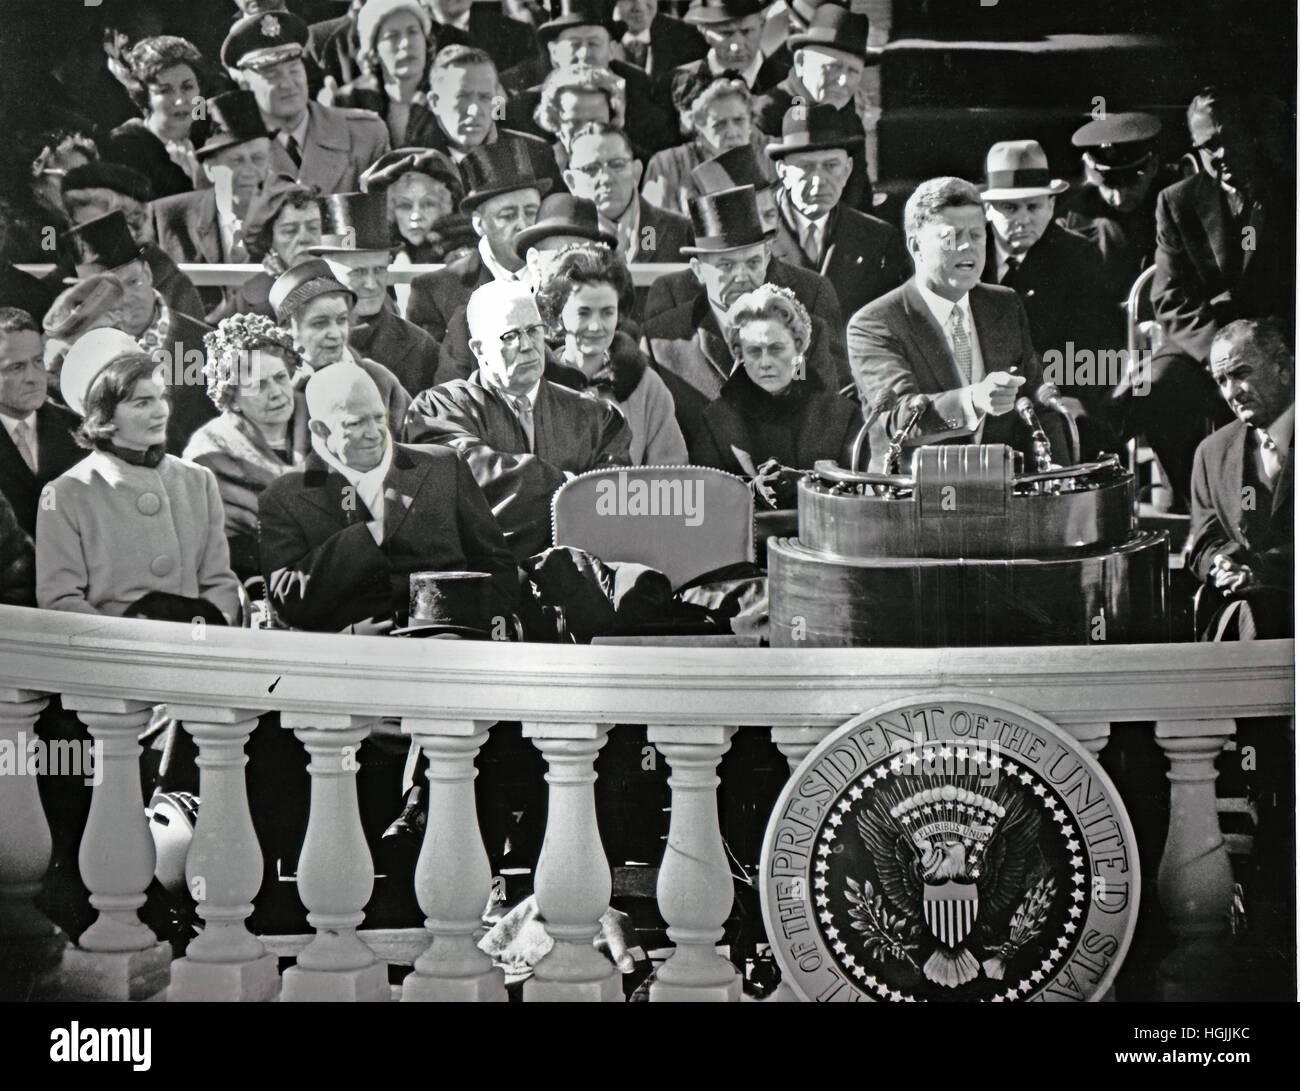 jfk inaugural address audience